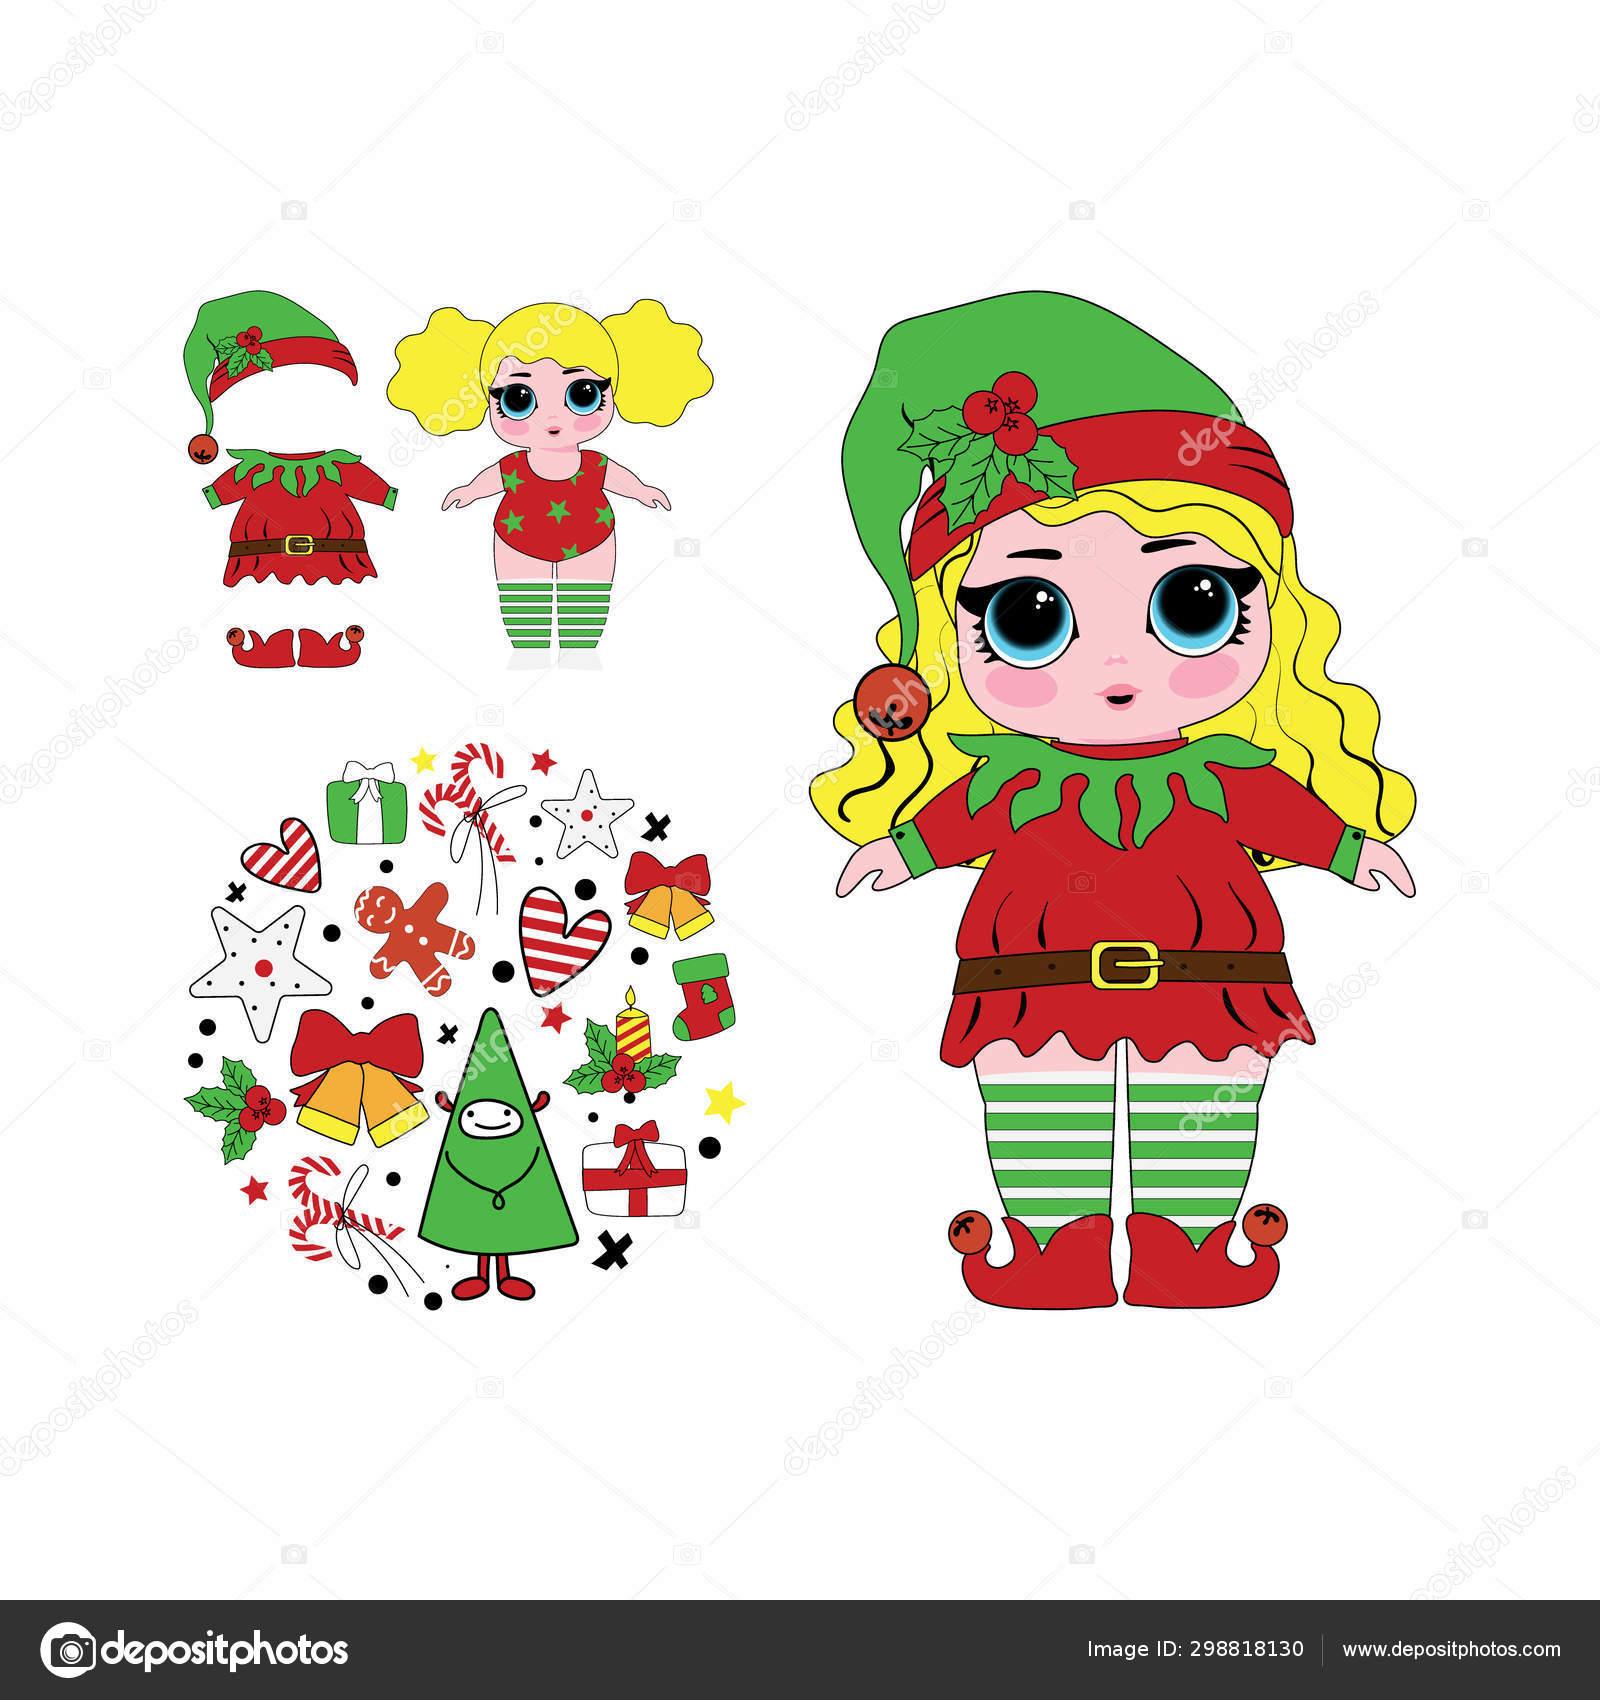 Christmas Elf Lol Doll Cute Vector Illustration Stock